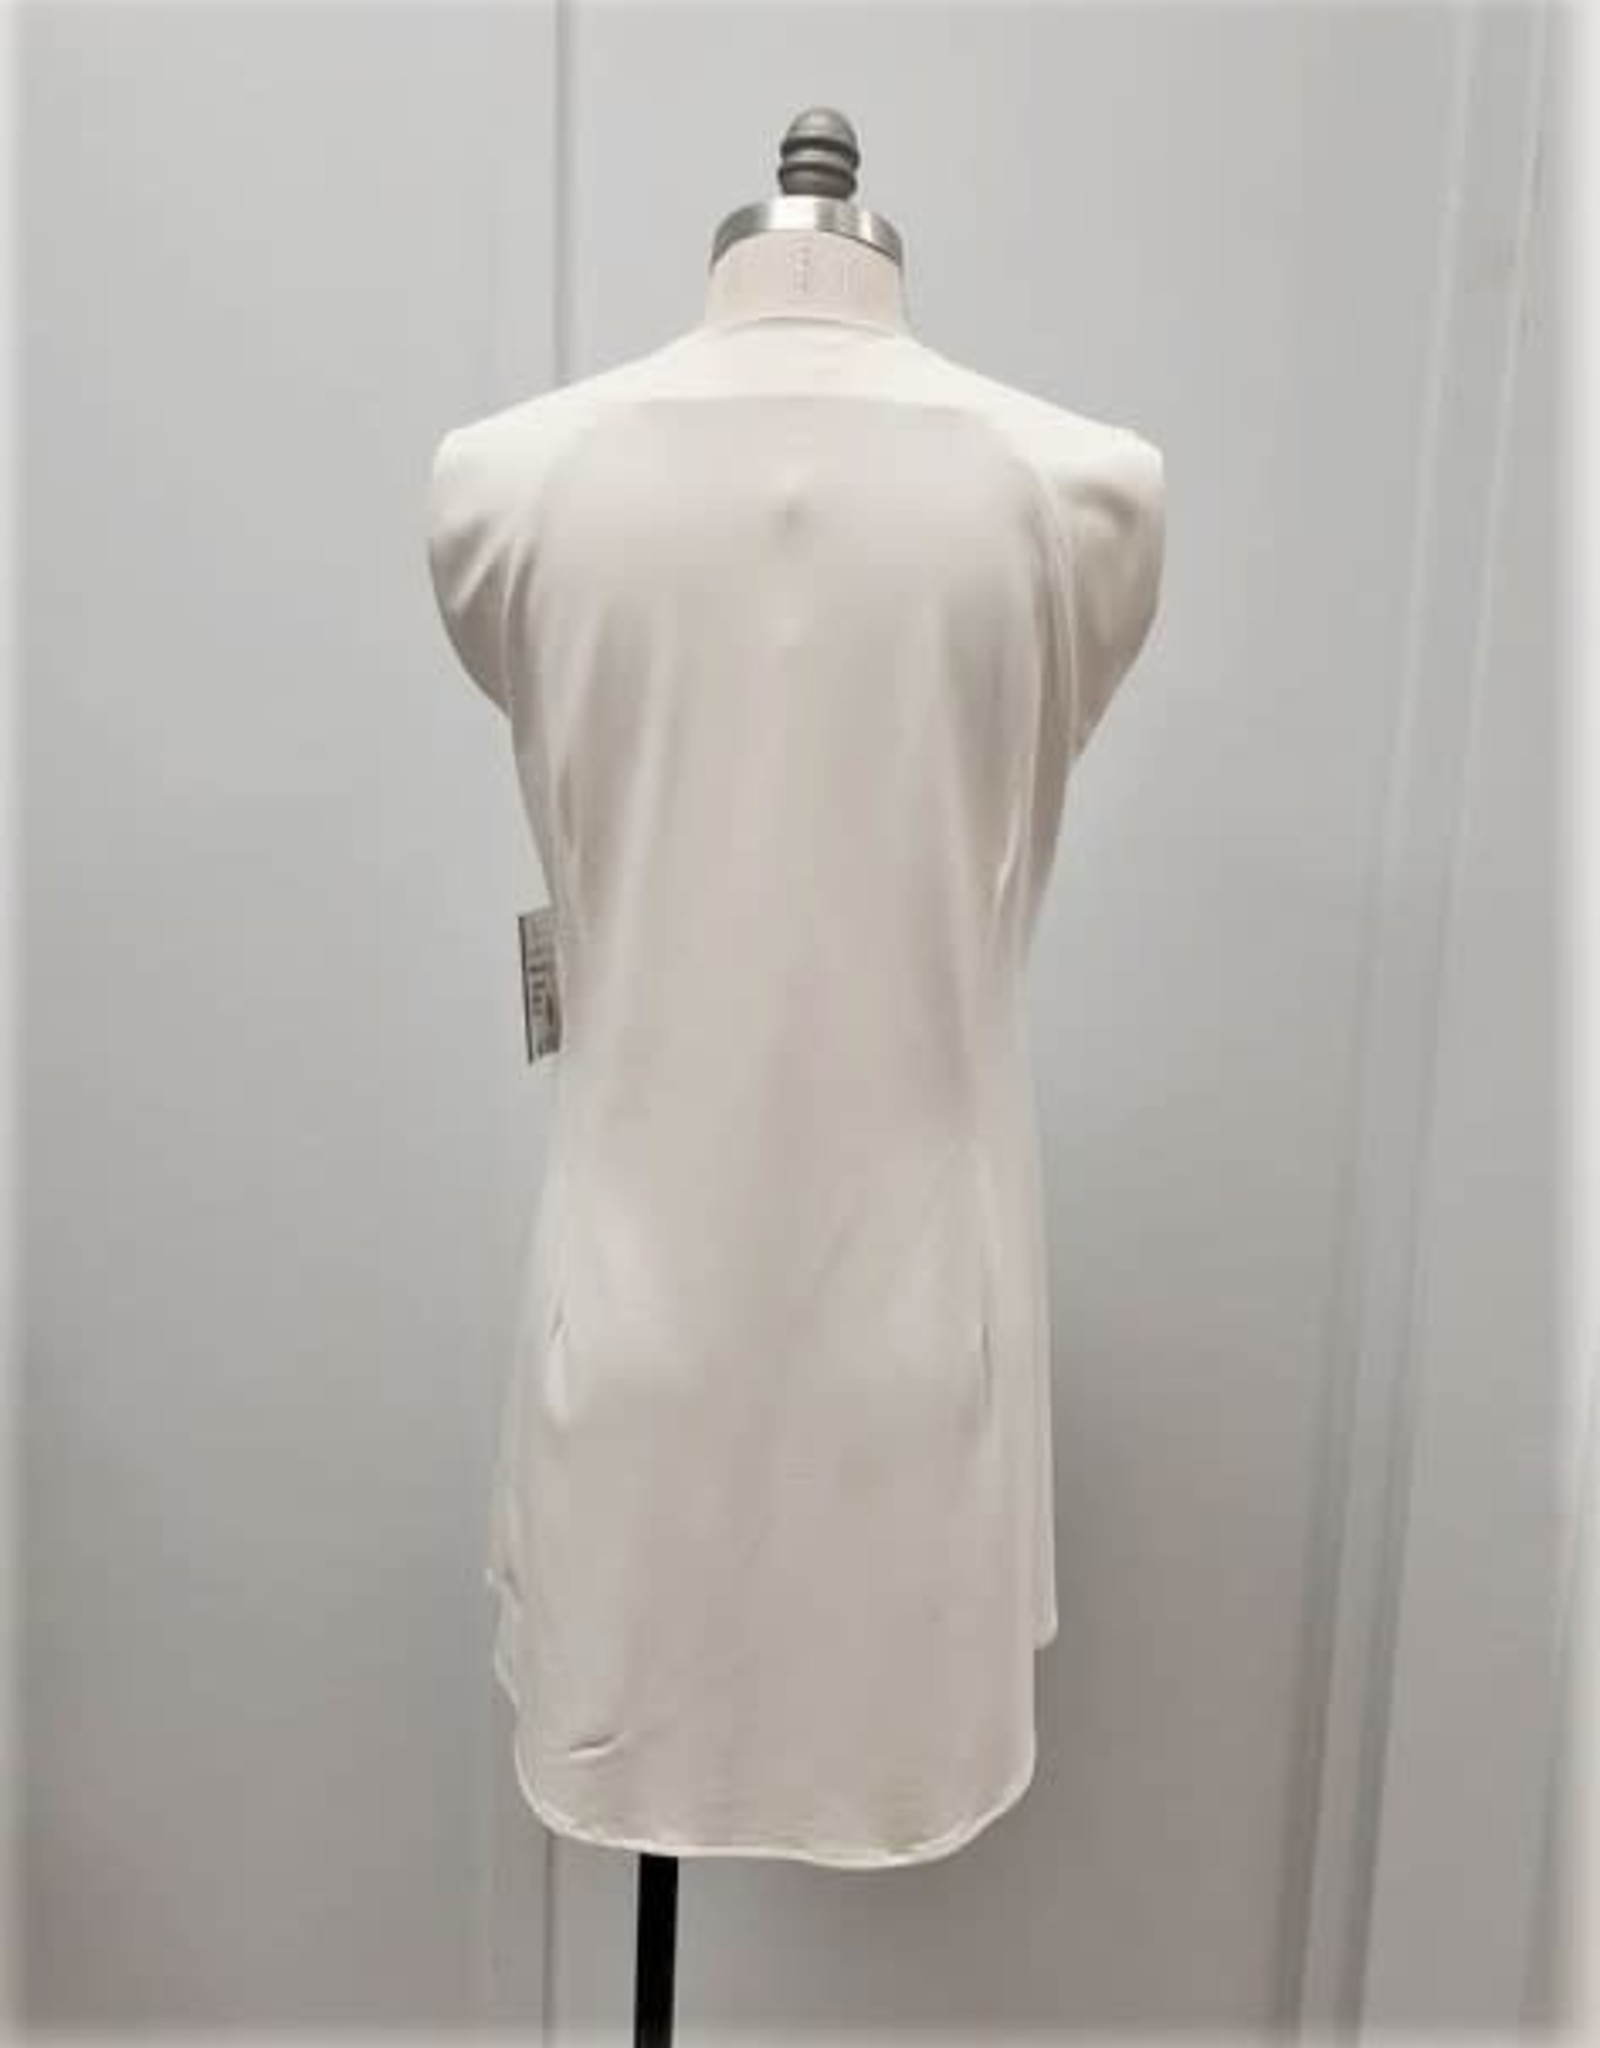 Sympli Sleeveless Rapt Tunic  - Size 12 (Consignment)